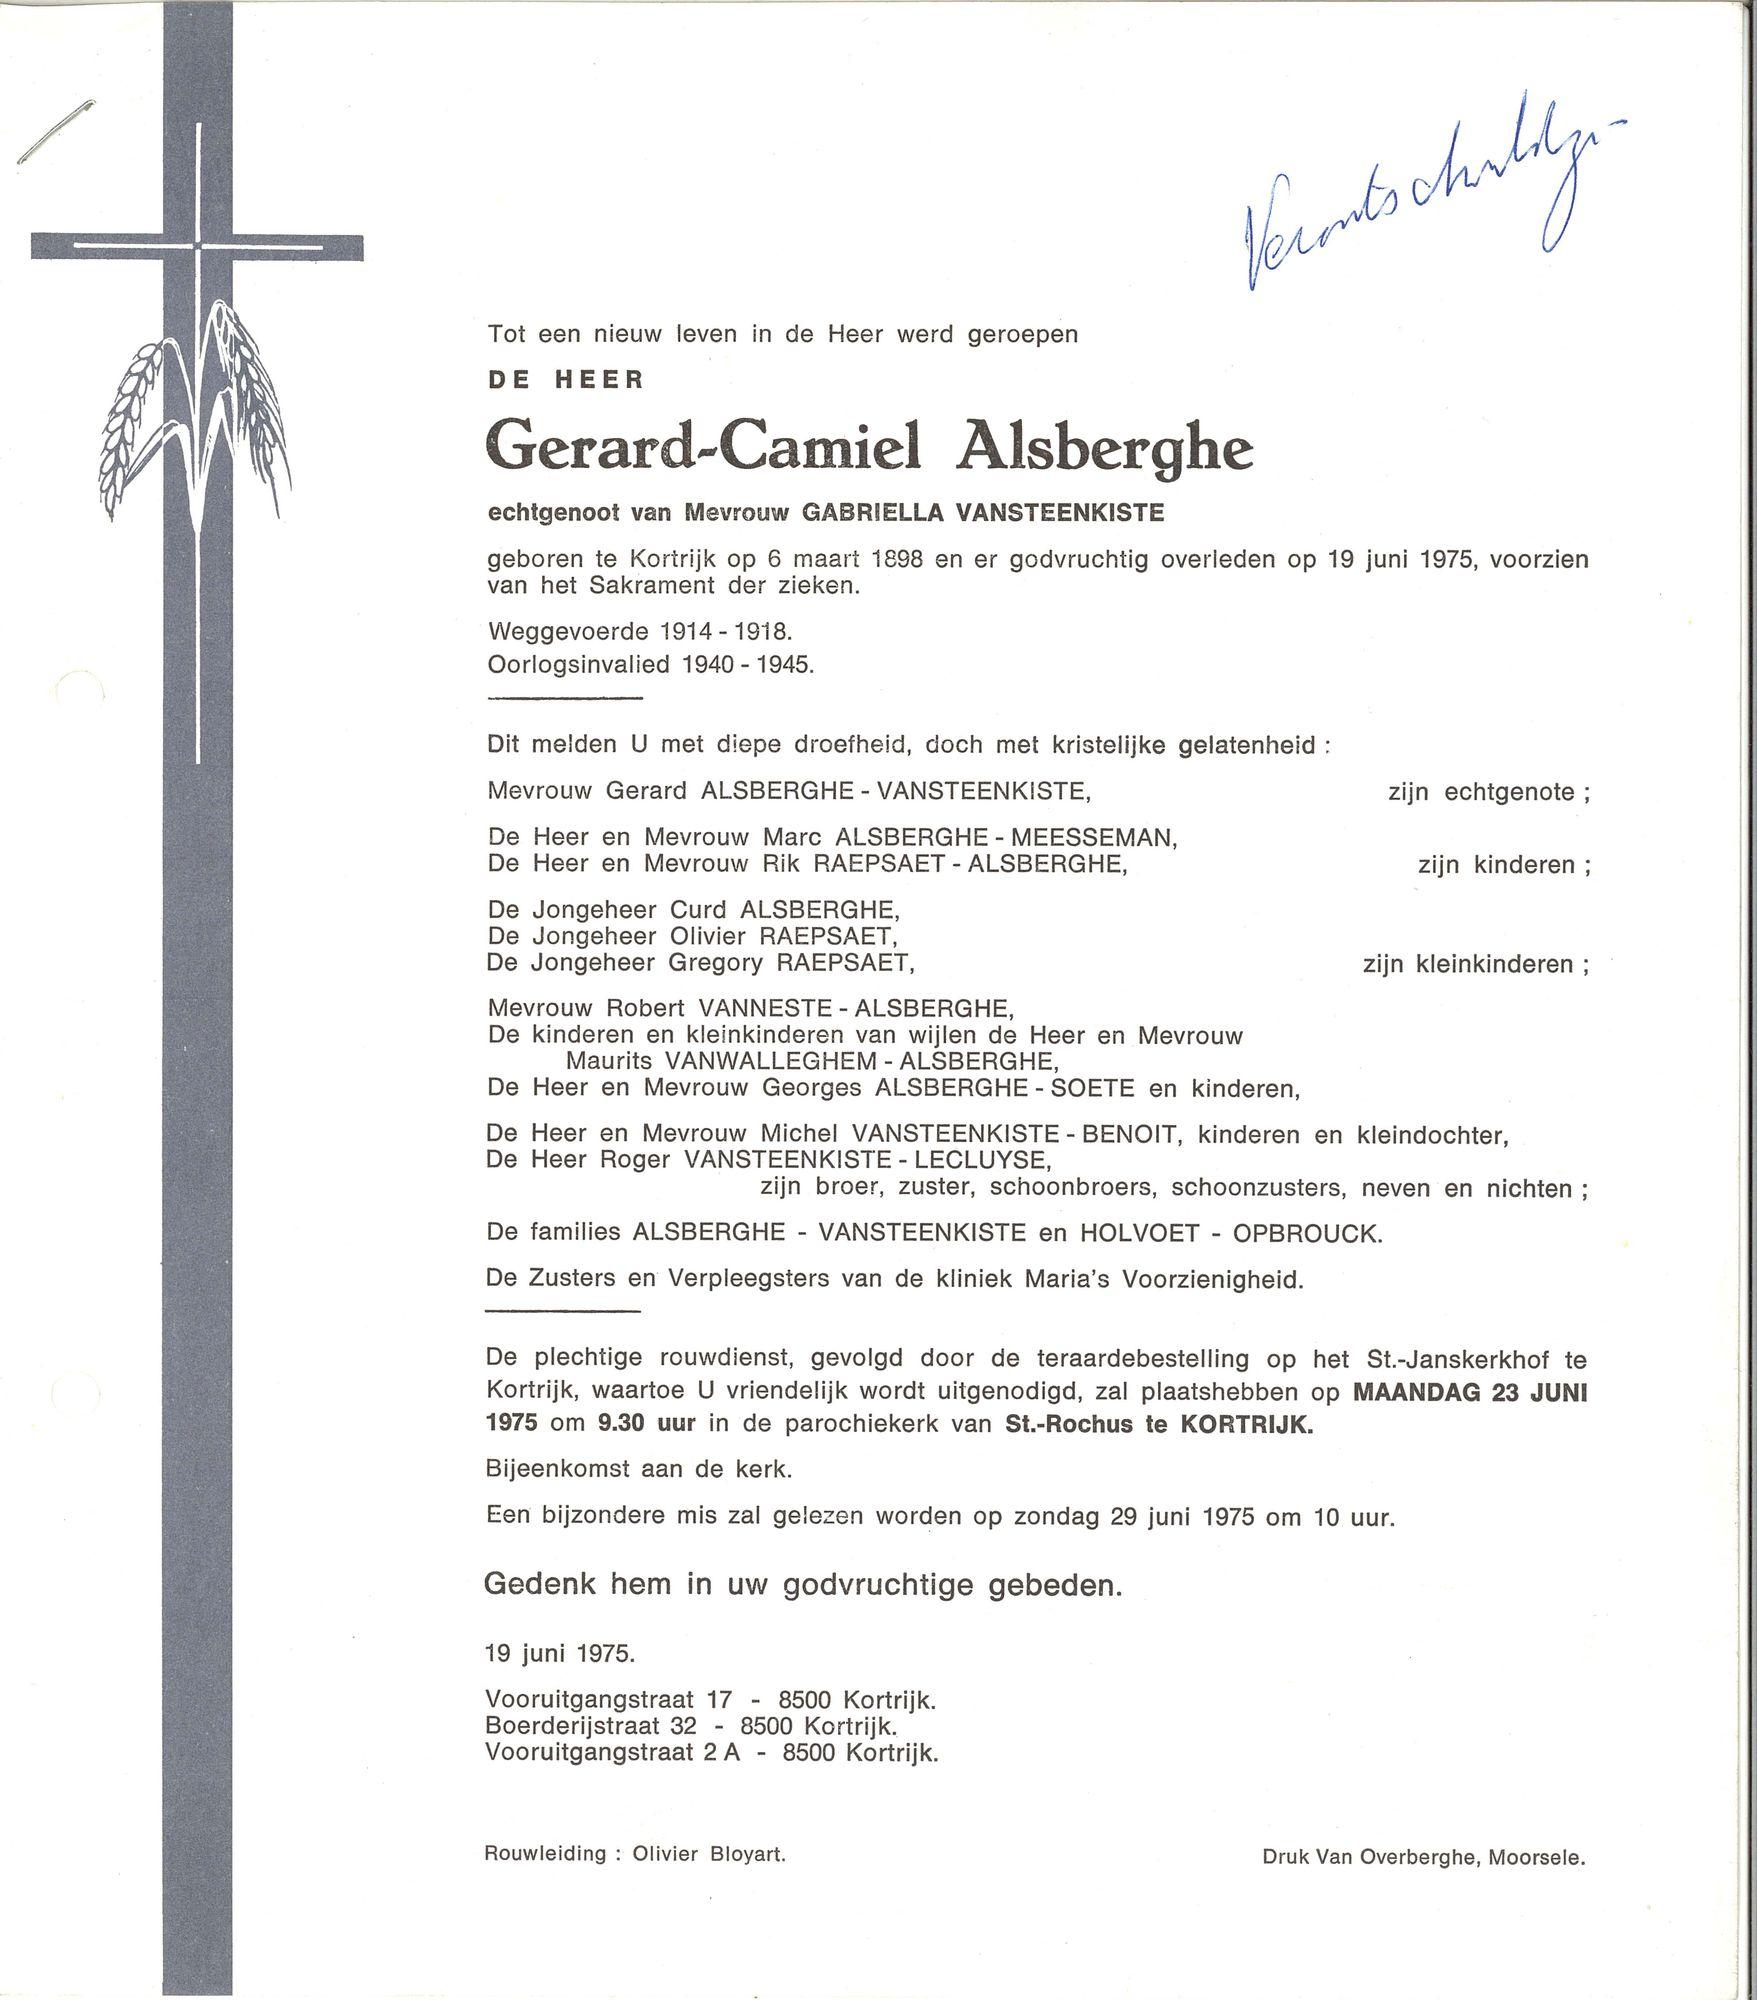 Gerard-Camiel Alsberghe